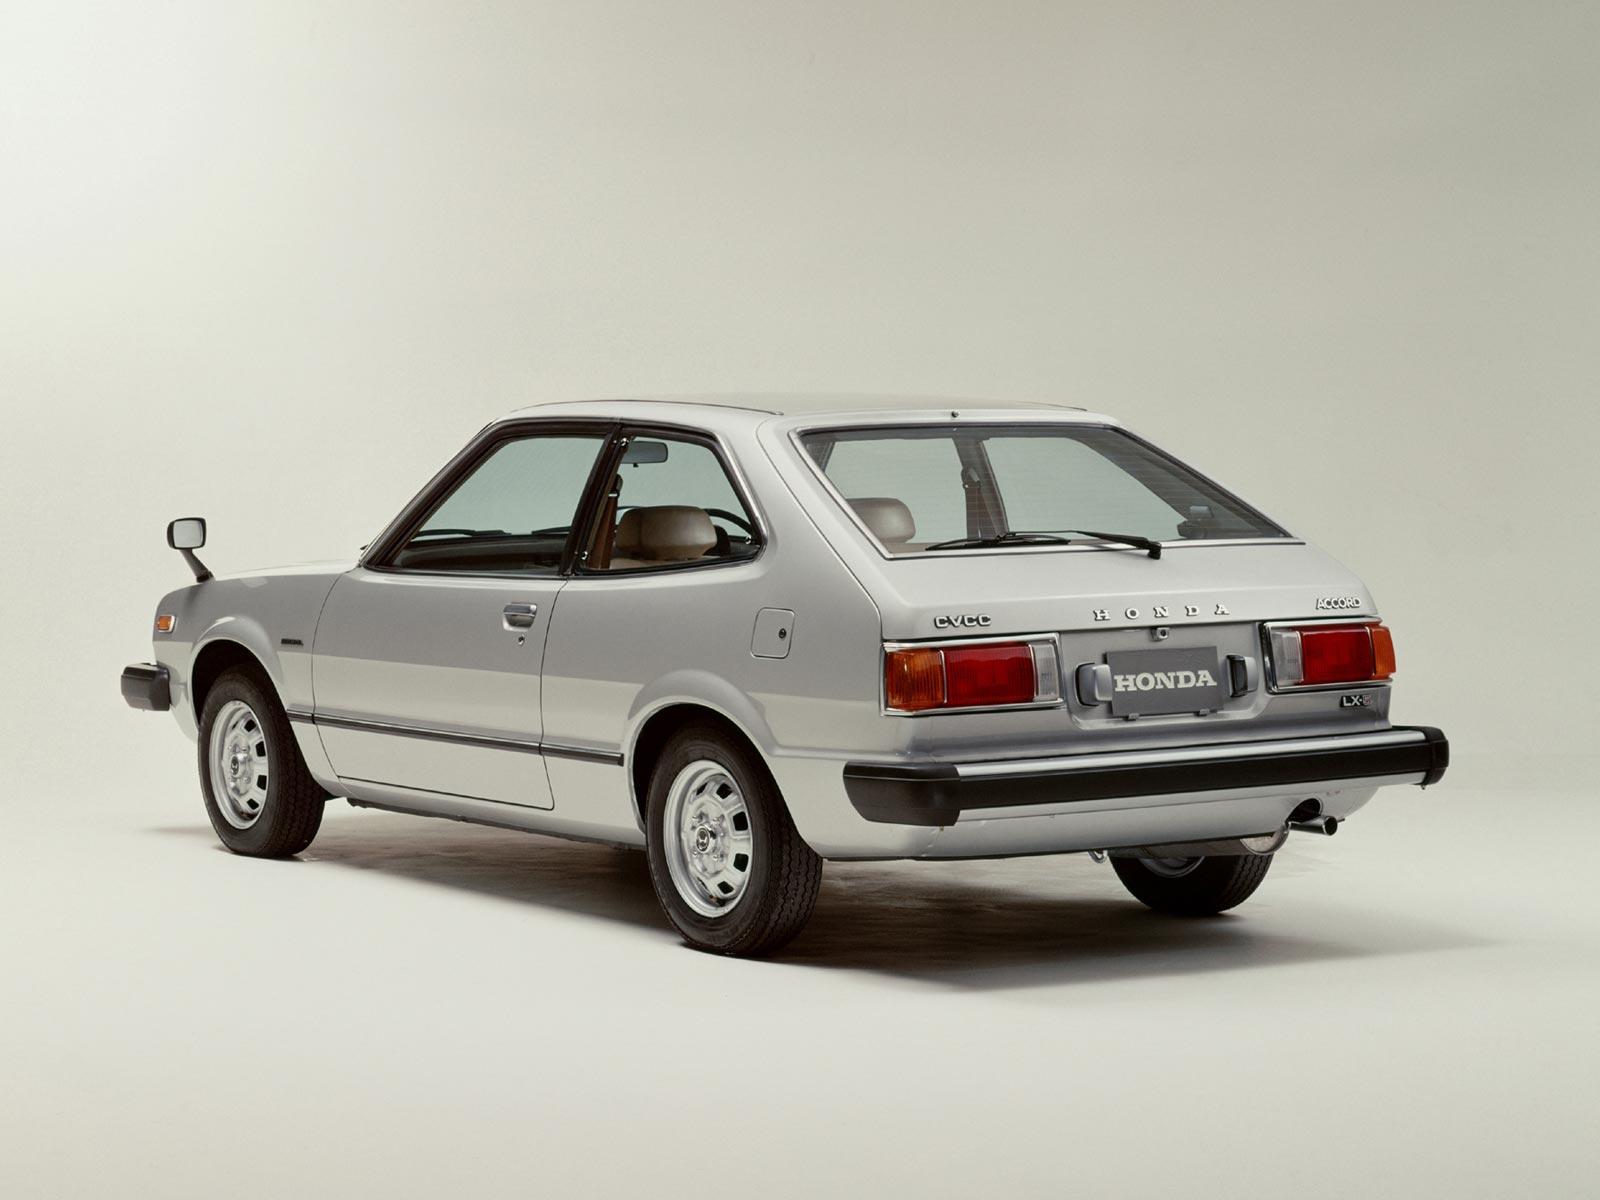 1976 1981 Honda Accord Hatchback Autoguru Katalog At